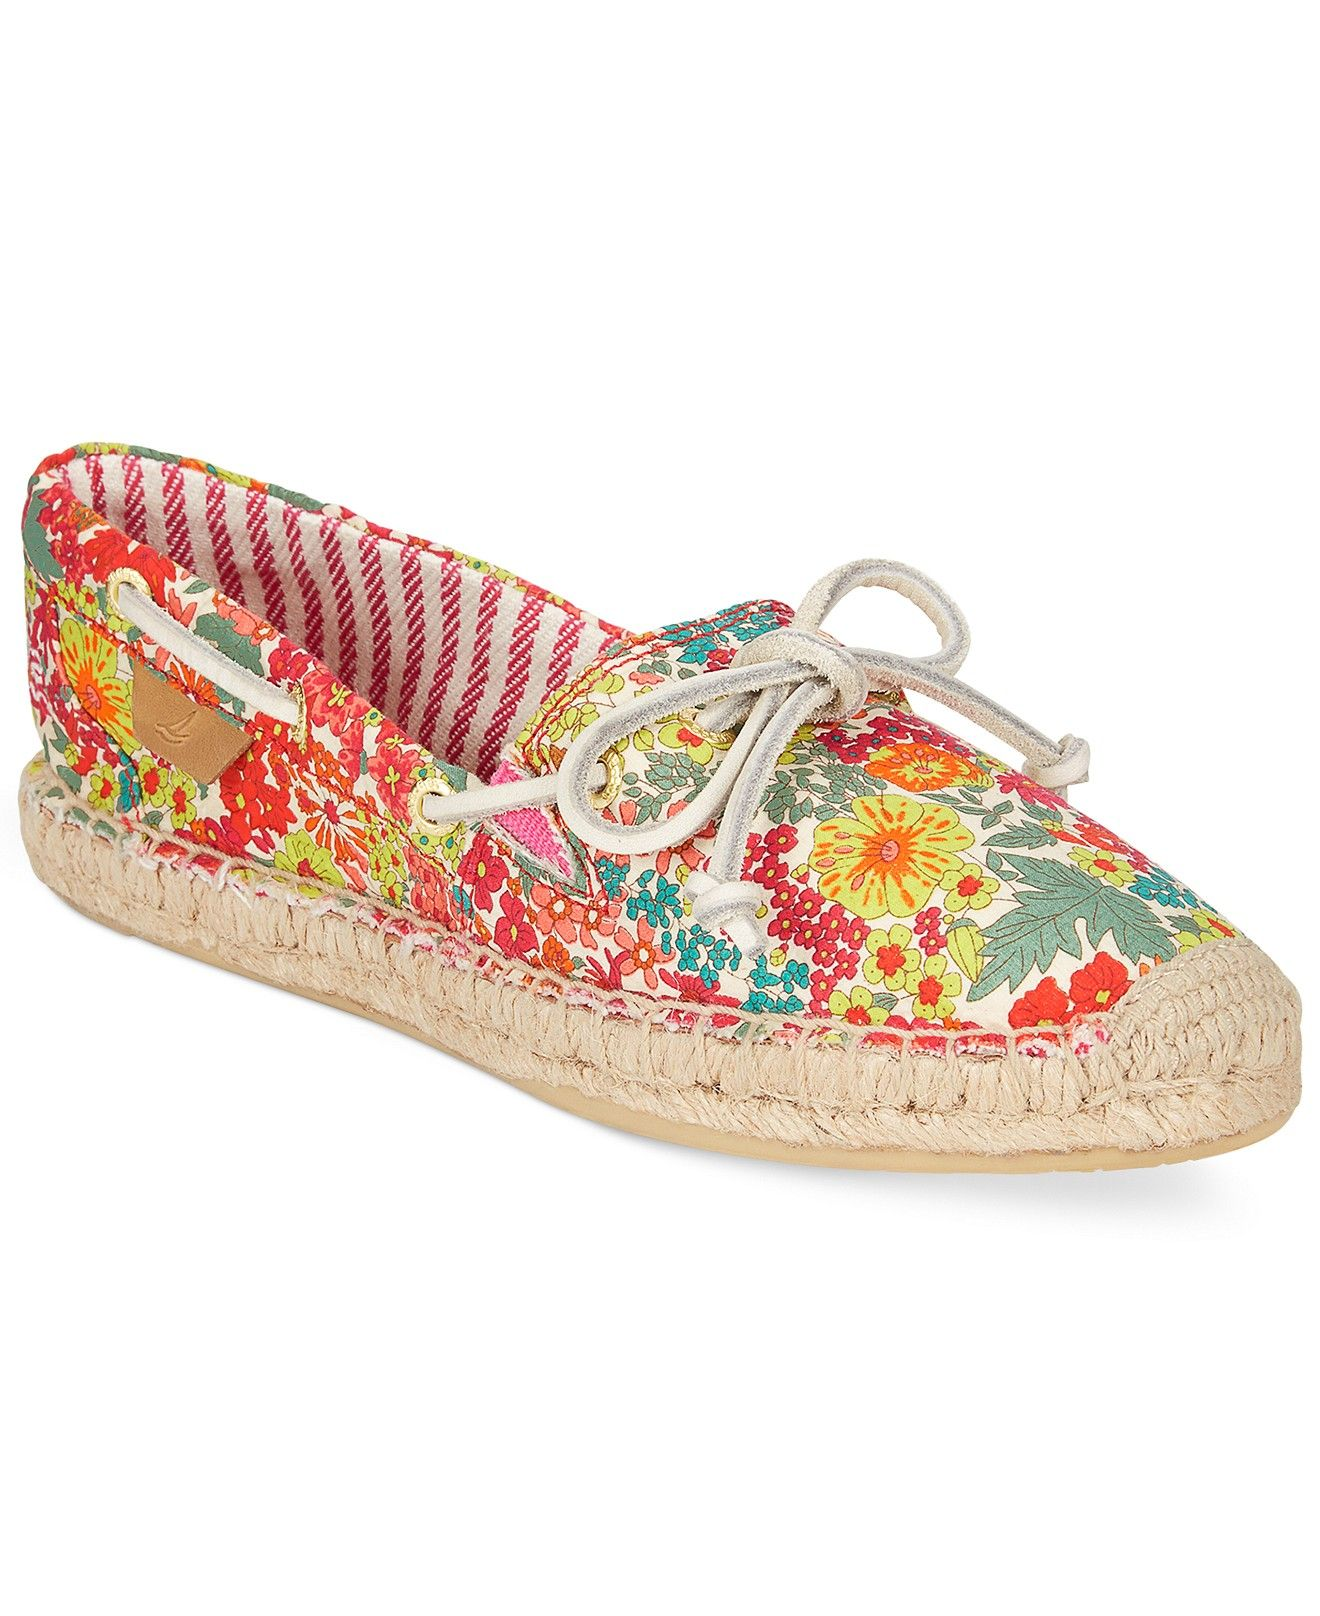 Femmes Sperry Katama Chaussures Plates BMqi7